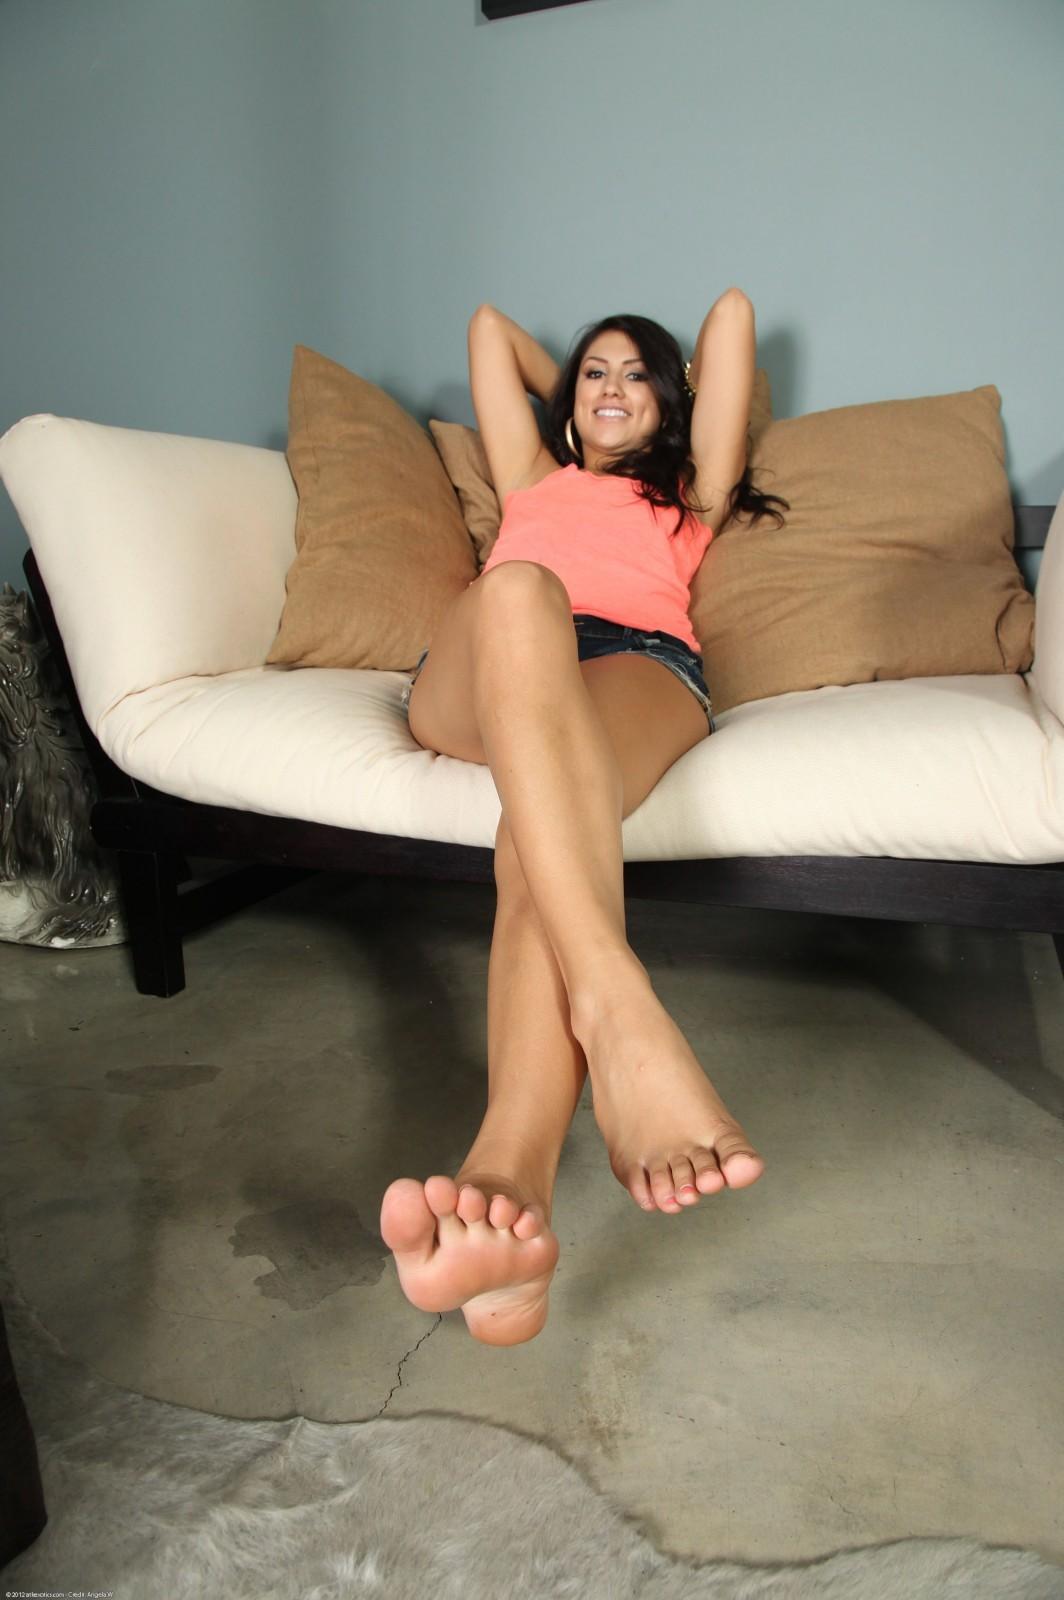 Olivia nice have a big sexy ass 6